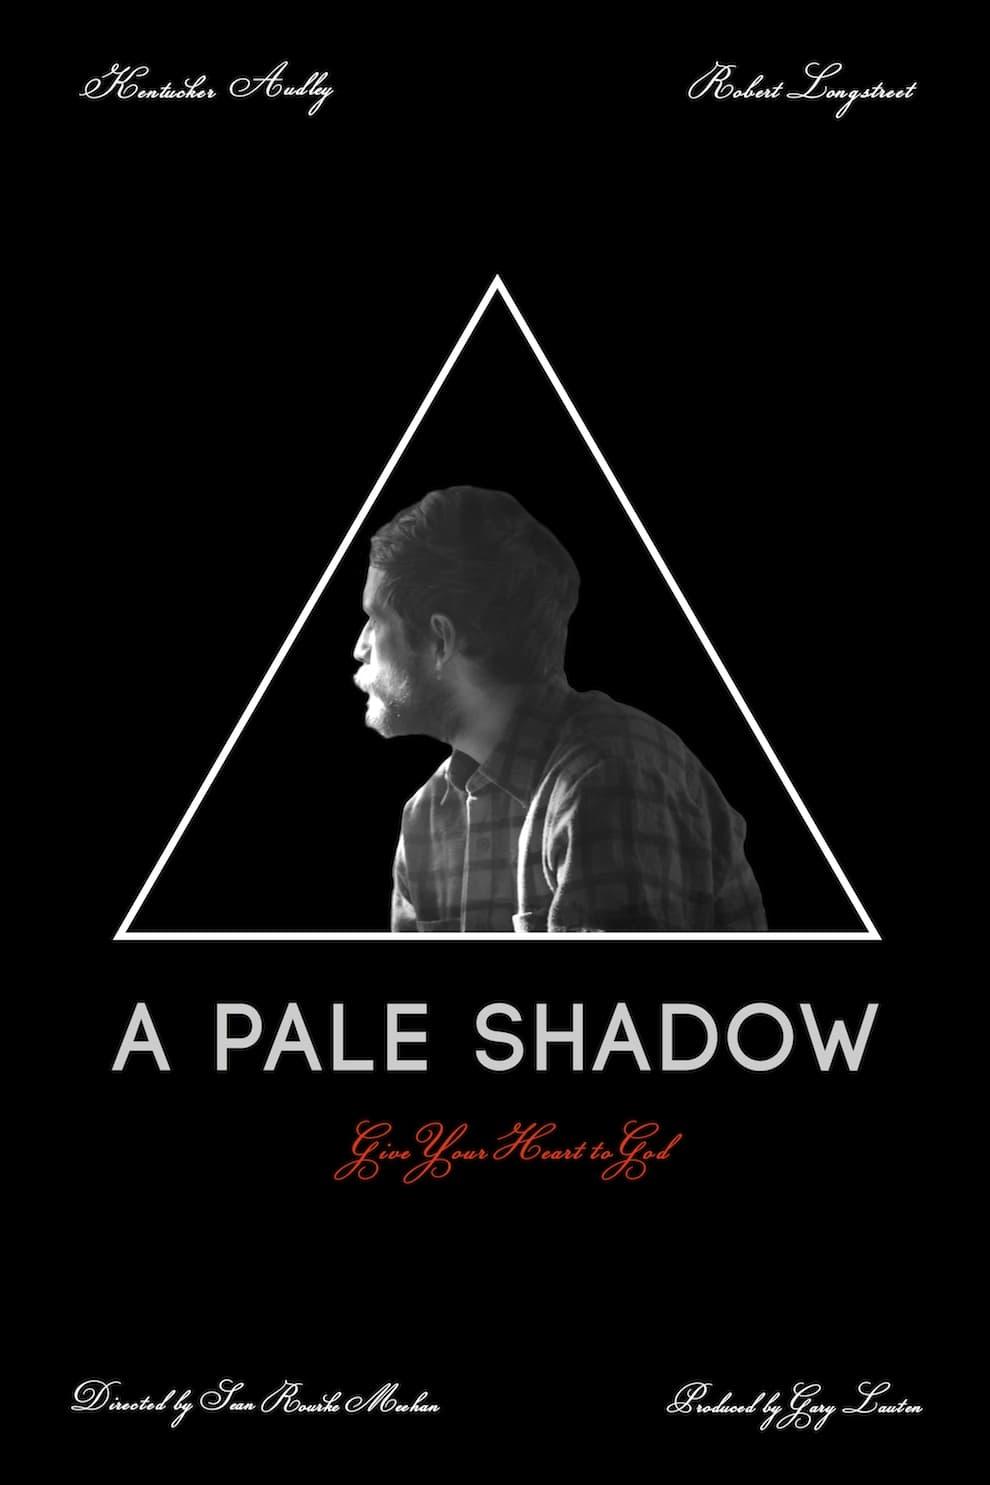 A Pale Shadow